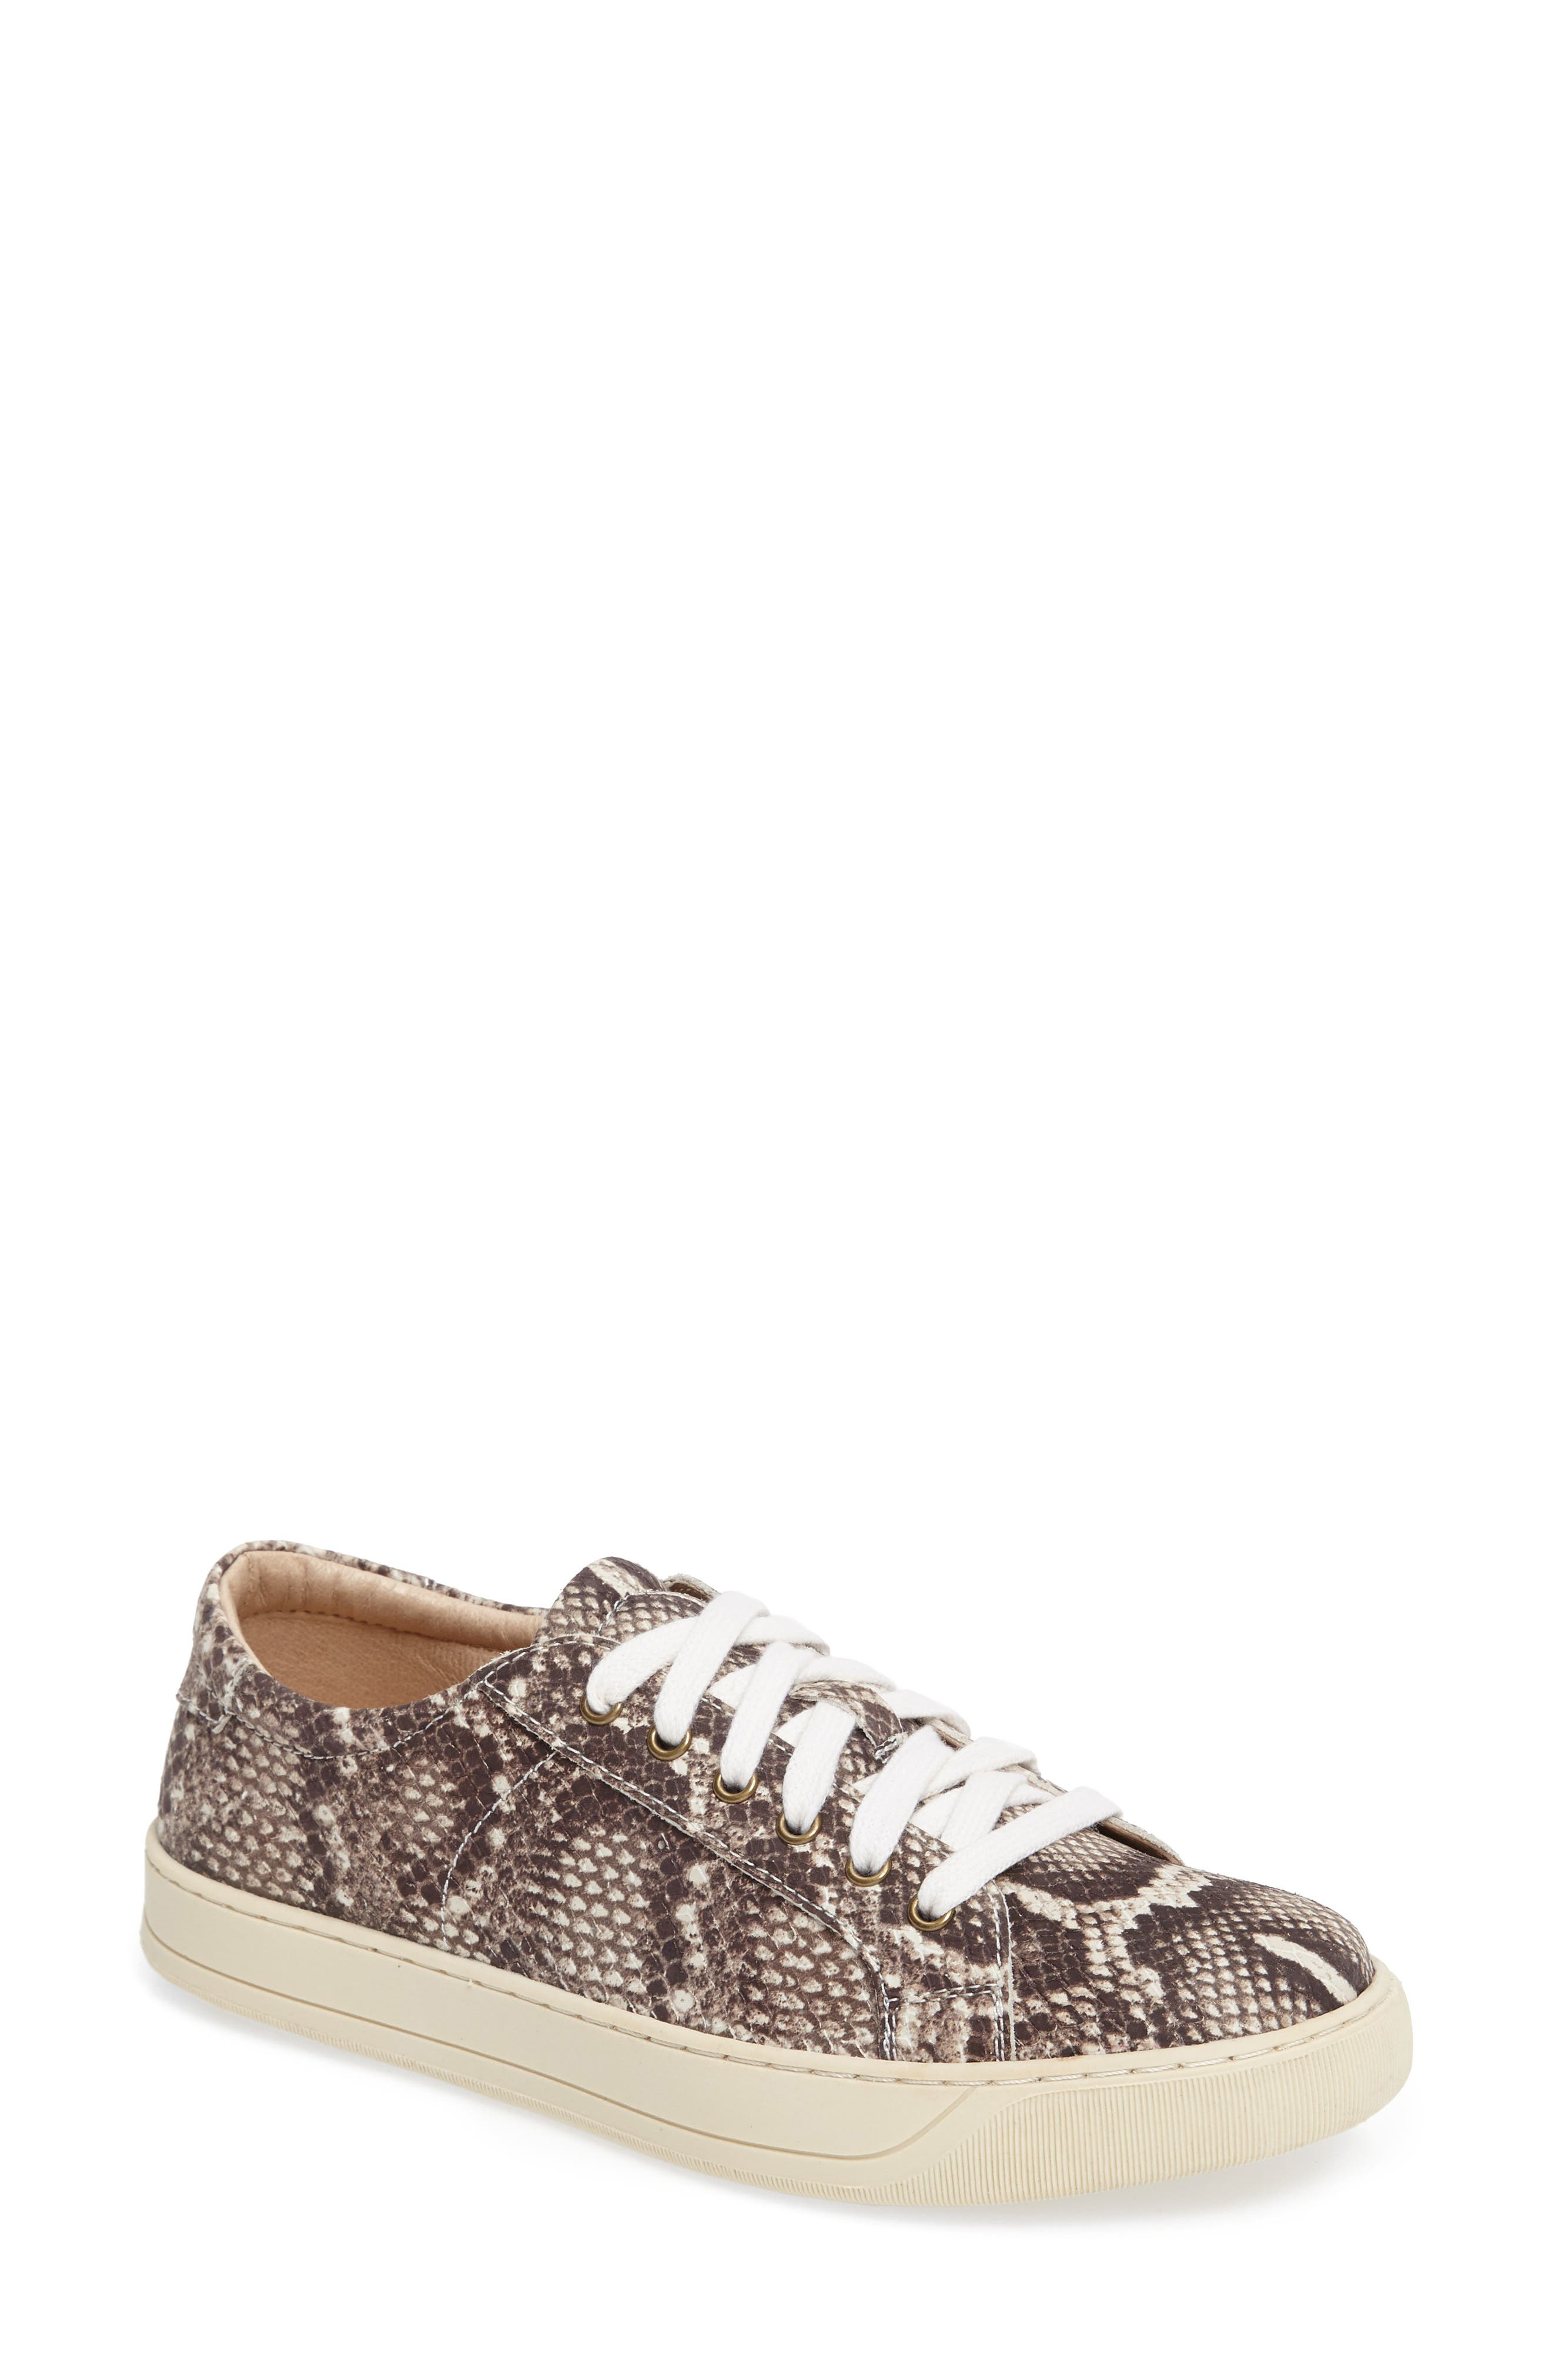 'Emerson' Sneaker,                             Main thumbnail 1, color,                             Snake Print Leather